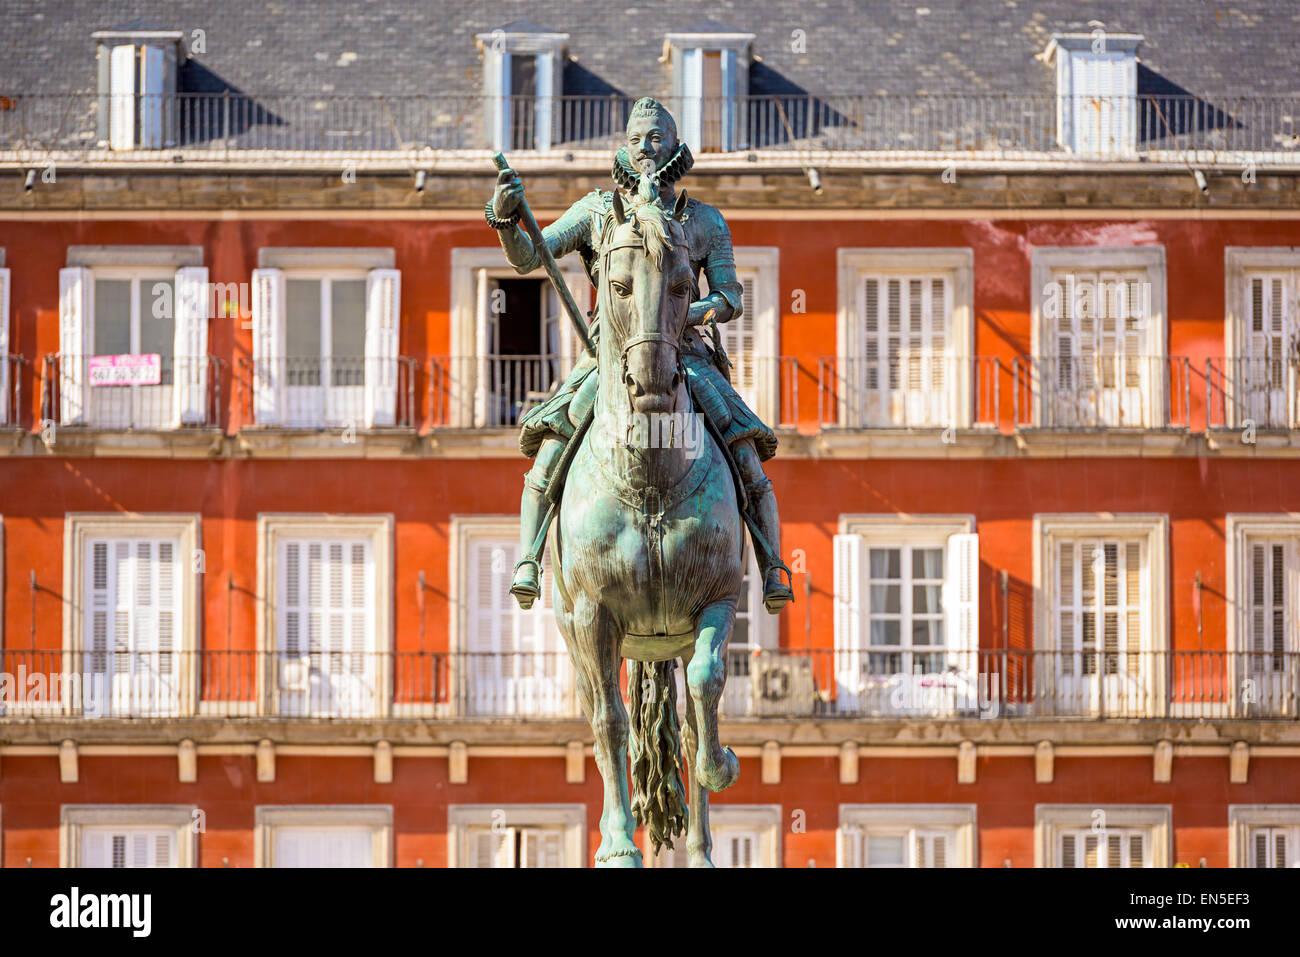 Madrid, Spain monument in Plaza de Espana. - Stock Image